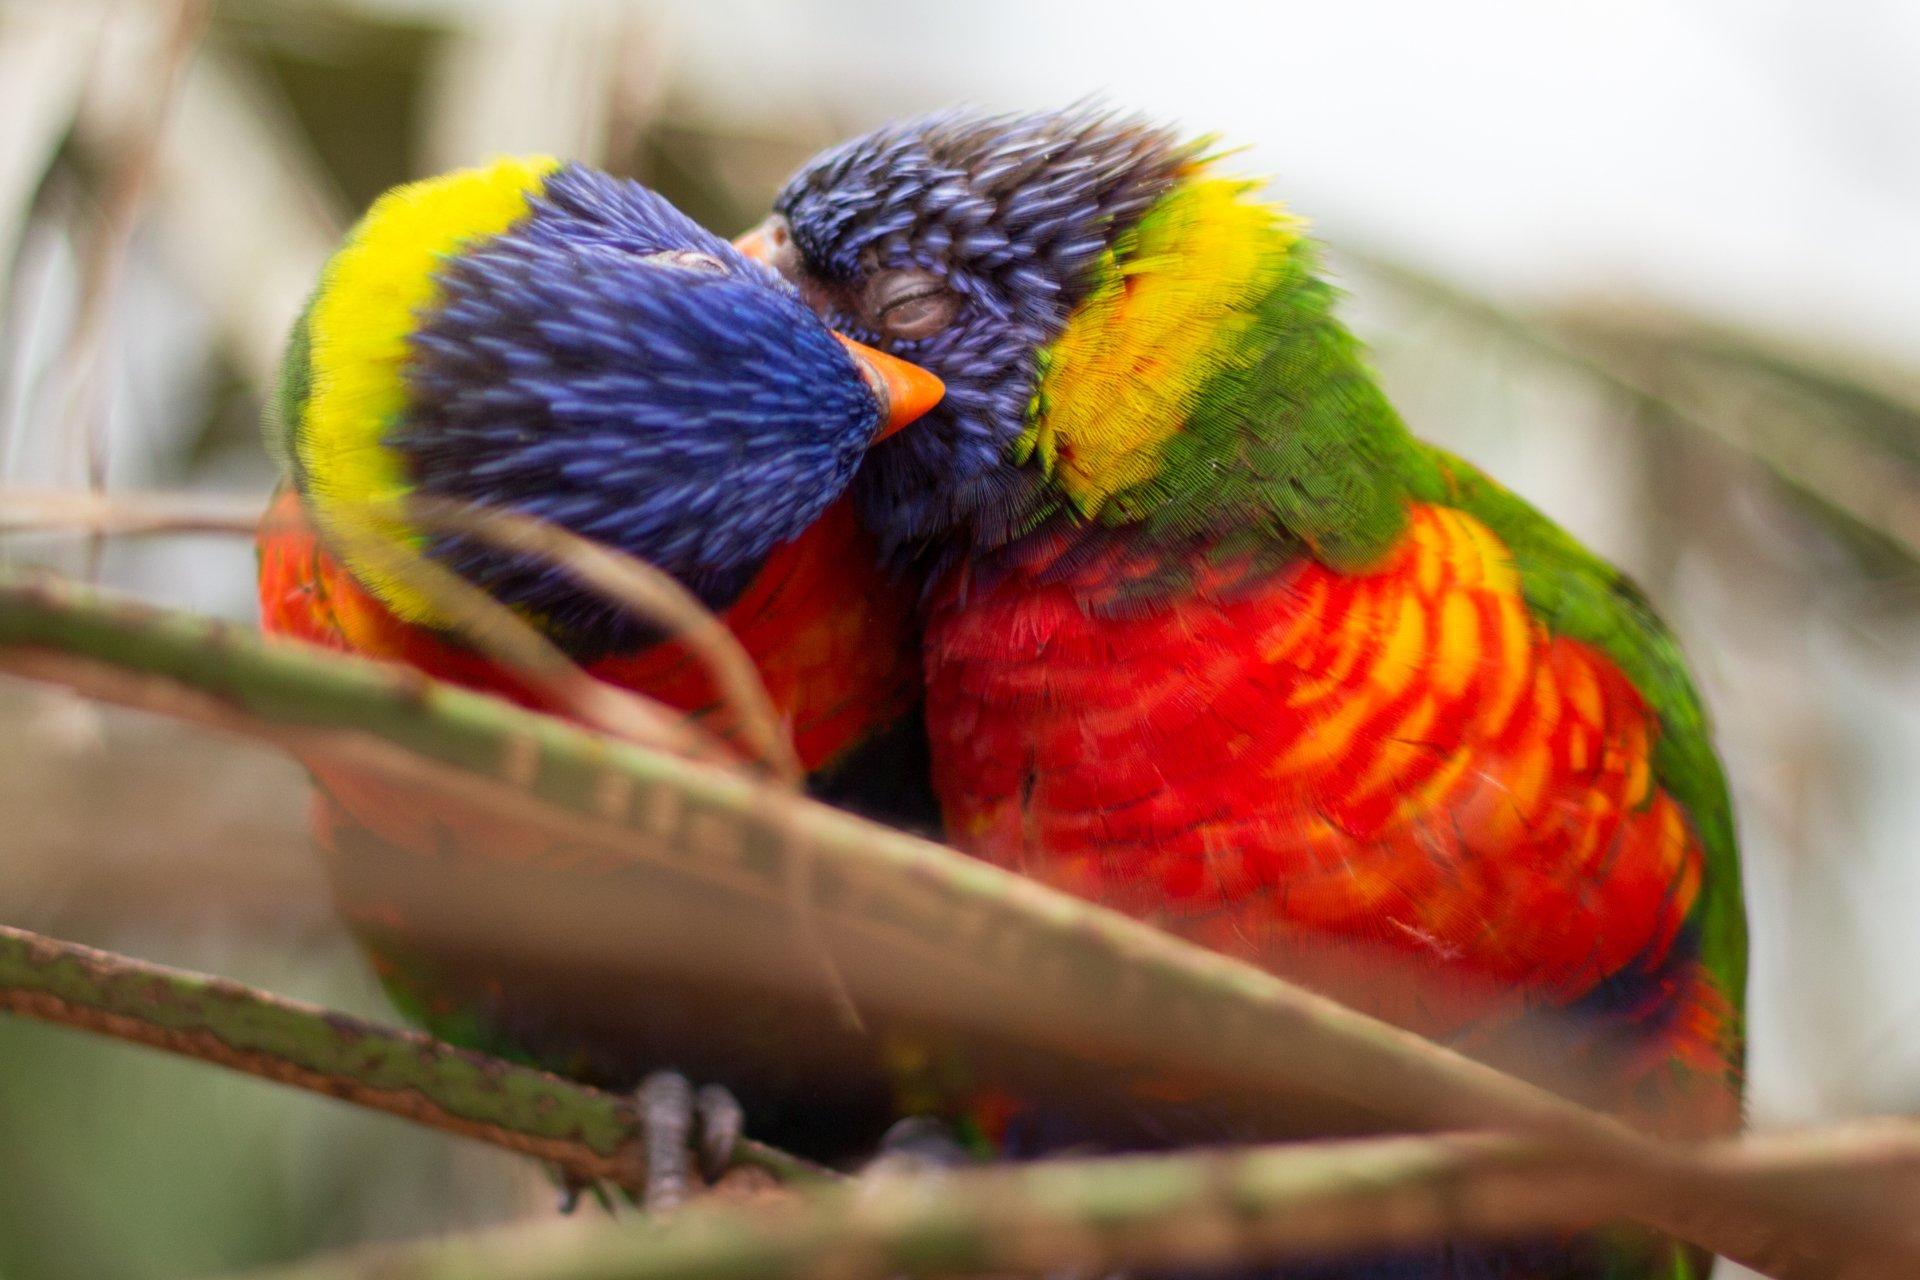 A Beautiful Couple Of Lorikeet Birds Wallpaper Hd: Rainbow Lorikeets HD Wallpaper